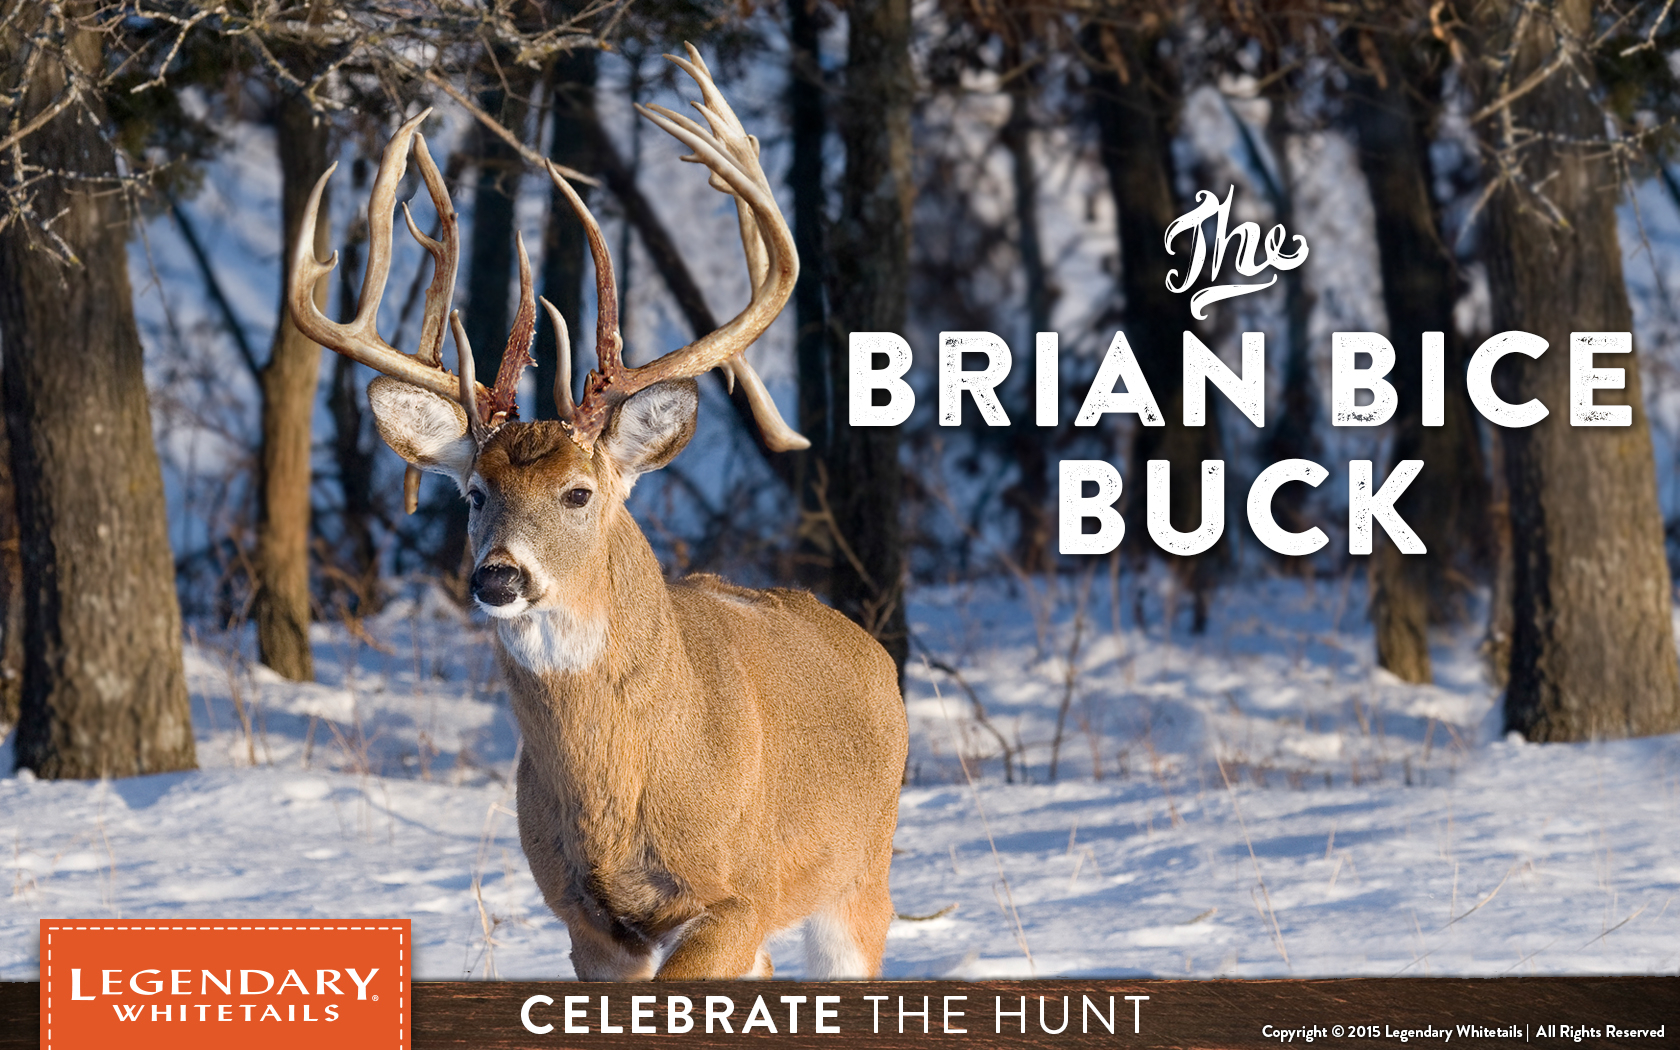 Brian Bice Buck - Legendary Whitetail'S Blog - Legendary